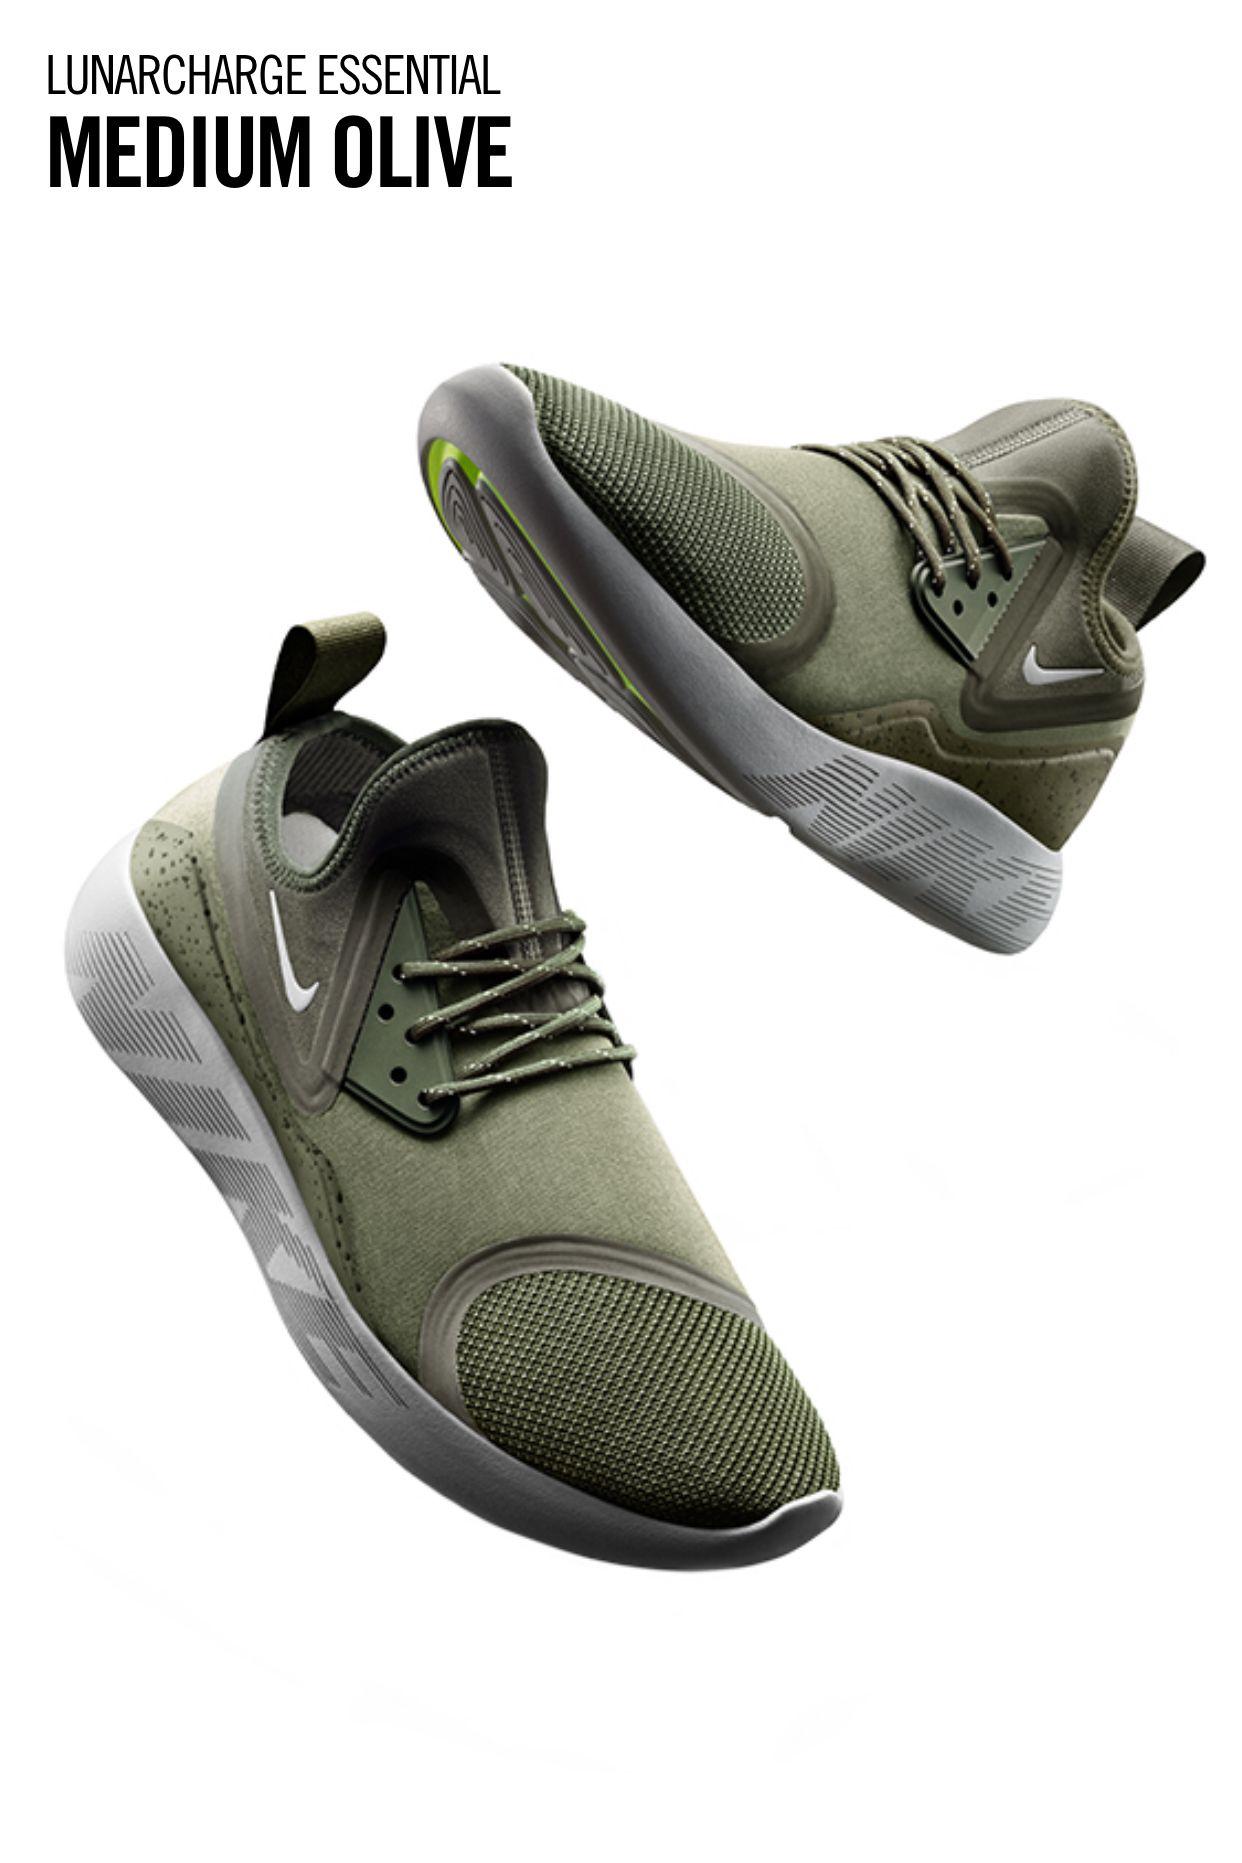 Via Nike+ SNKRS: nike.com/snkrs/thread/1ffa32064e23deb02765878aa0731aac4cd2c0c4